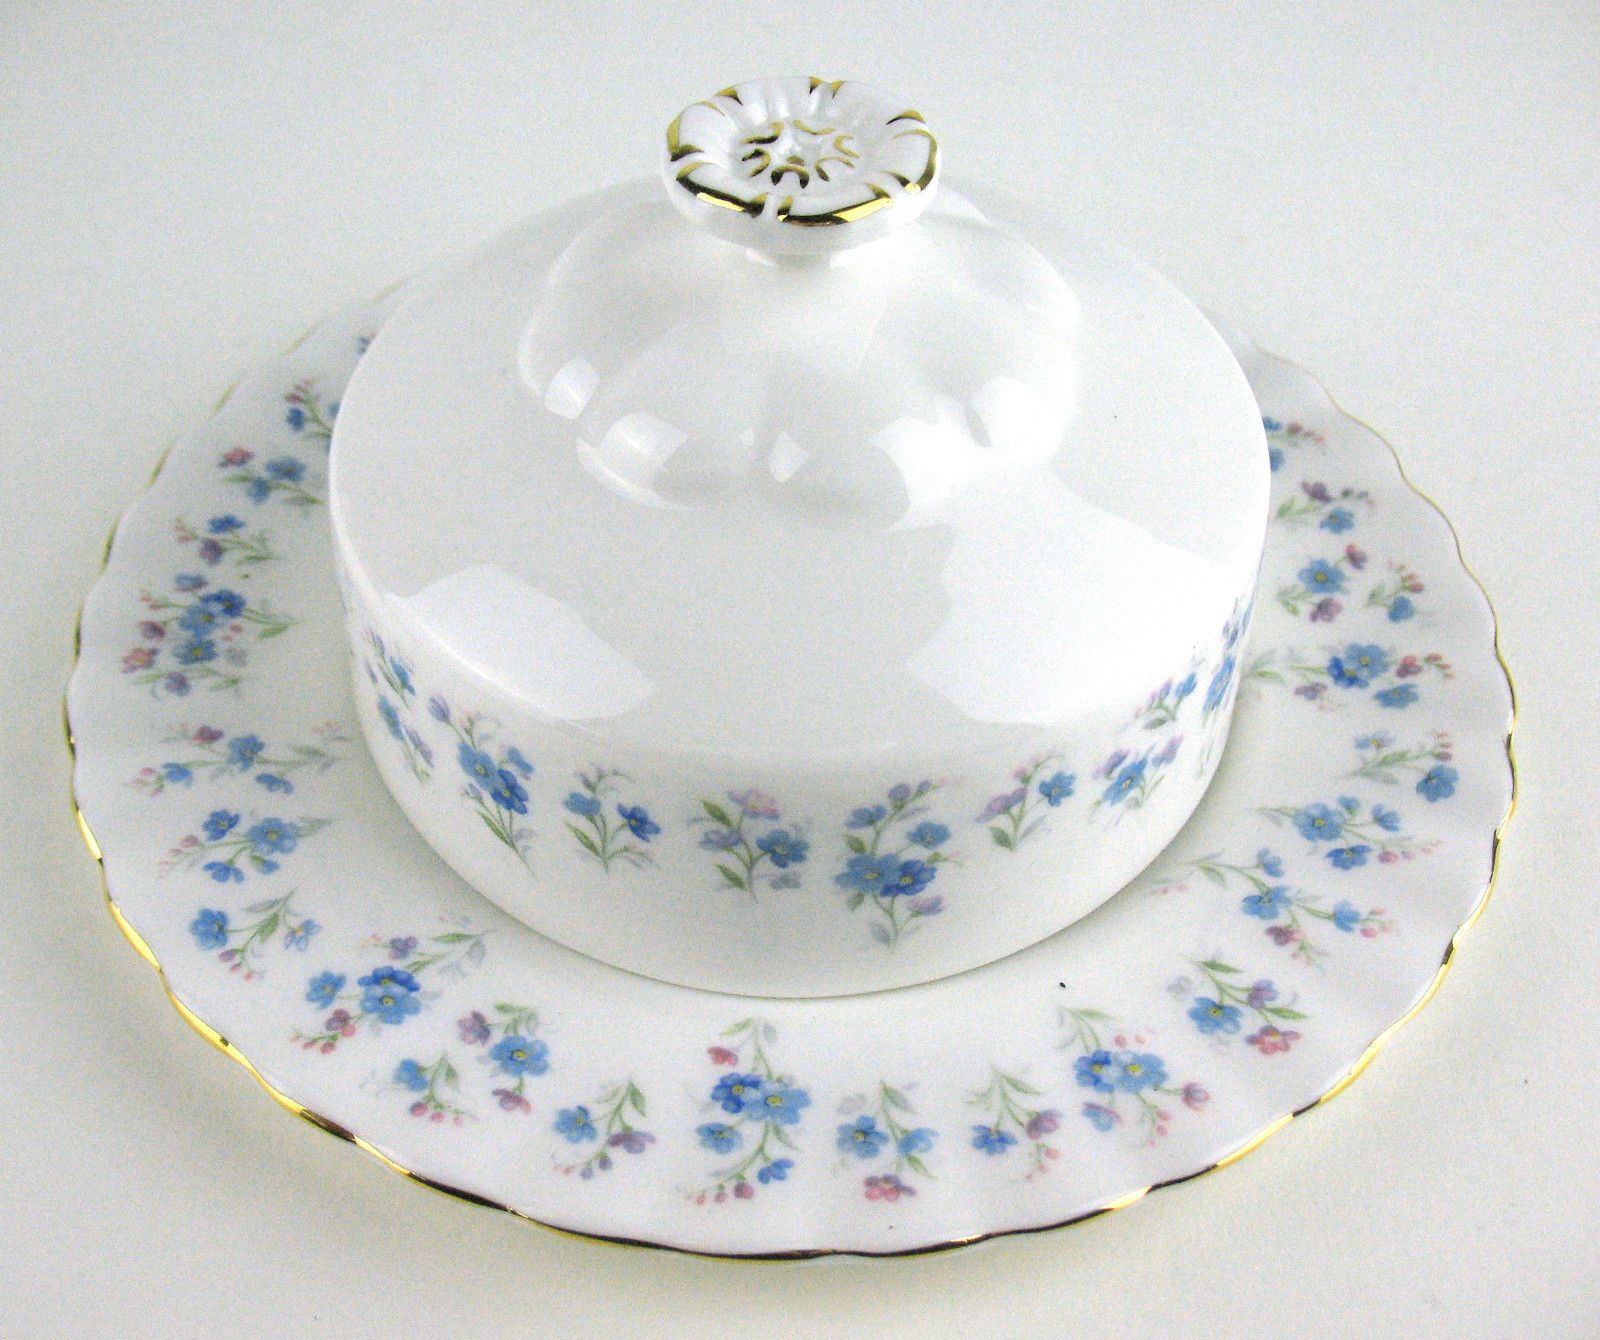 Royal albert bone china tea cup amp saucer winsome pattern ebay - Butter Dish Royal Albert Memory Lane England Ebay Butter Dishroyal Albertbone Chinasandwichestea Cupsdepressiondishesporcelainengland